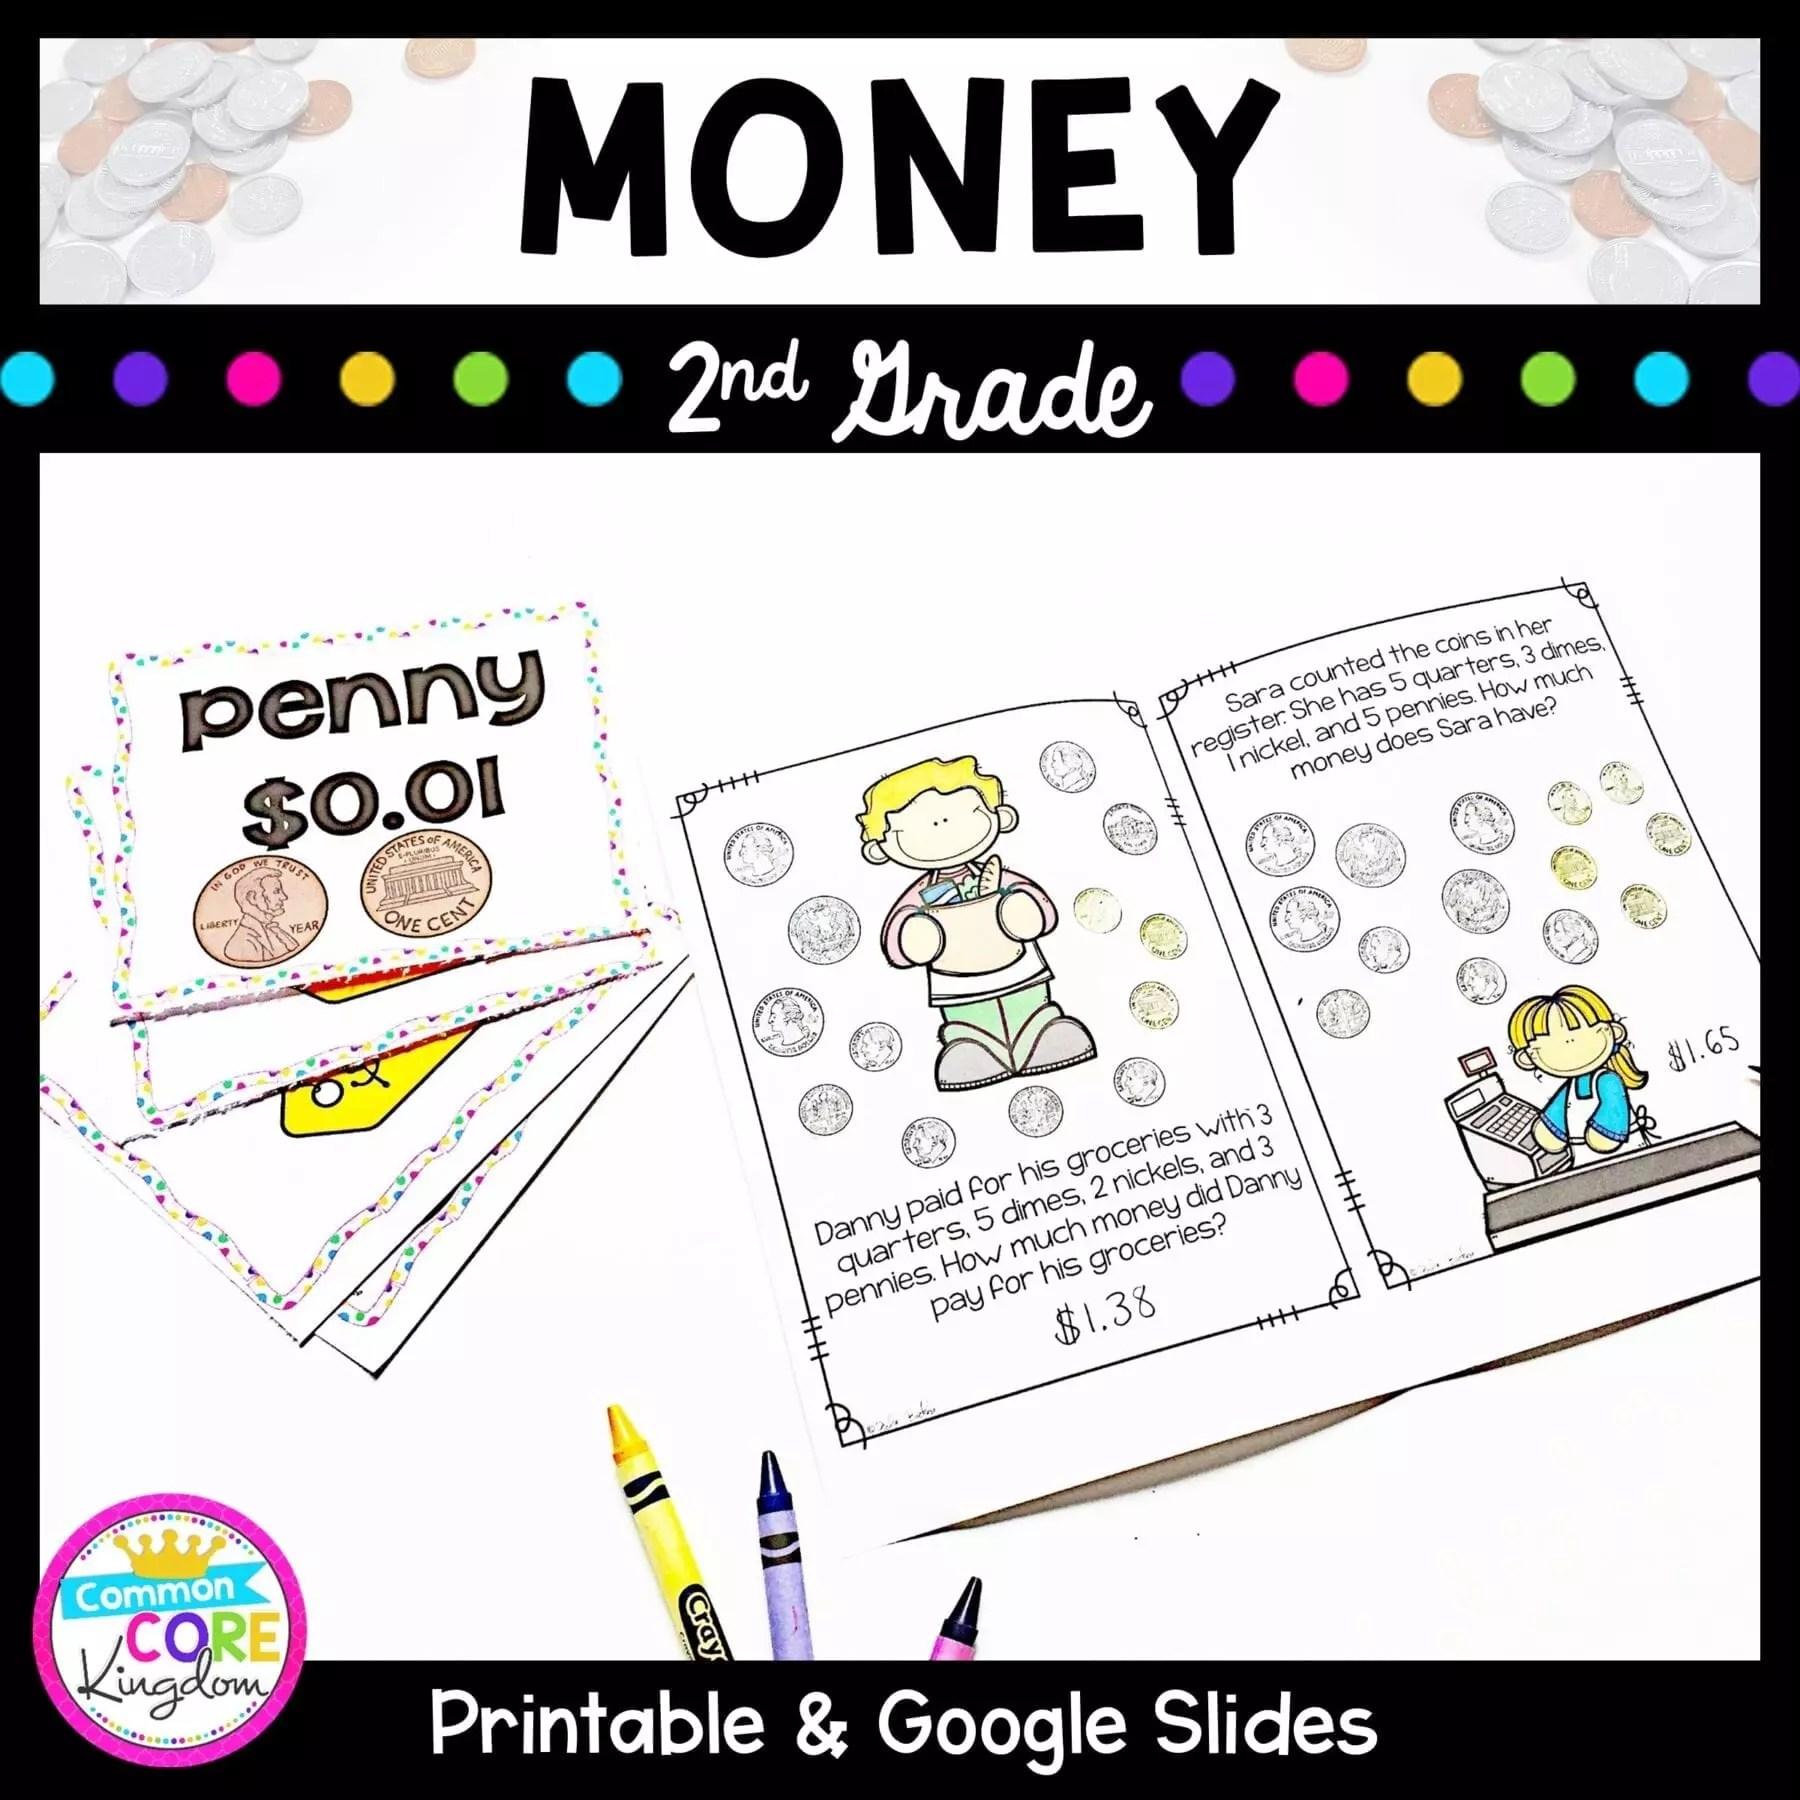 Money - 2nd Grade Math 2.MD.C.8 - Google Slides Distance Learning Pack    Common Core Kingdom   Math Skills [ 1800 x 1800 Pixel ]